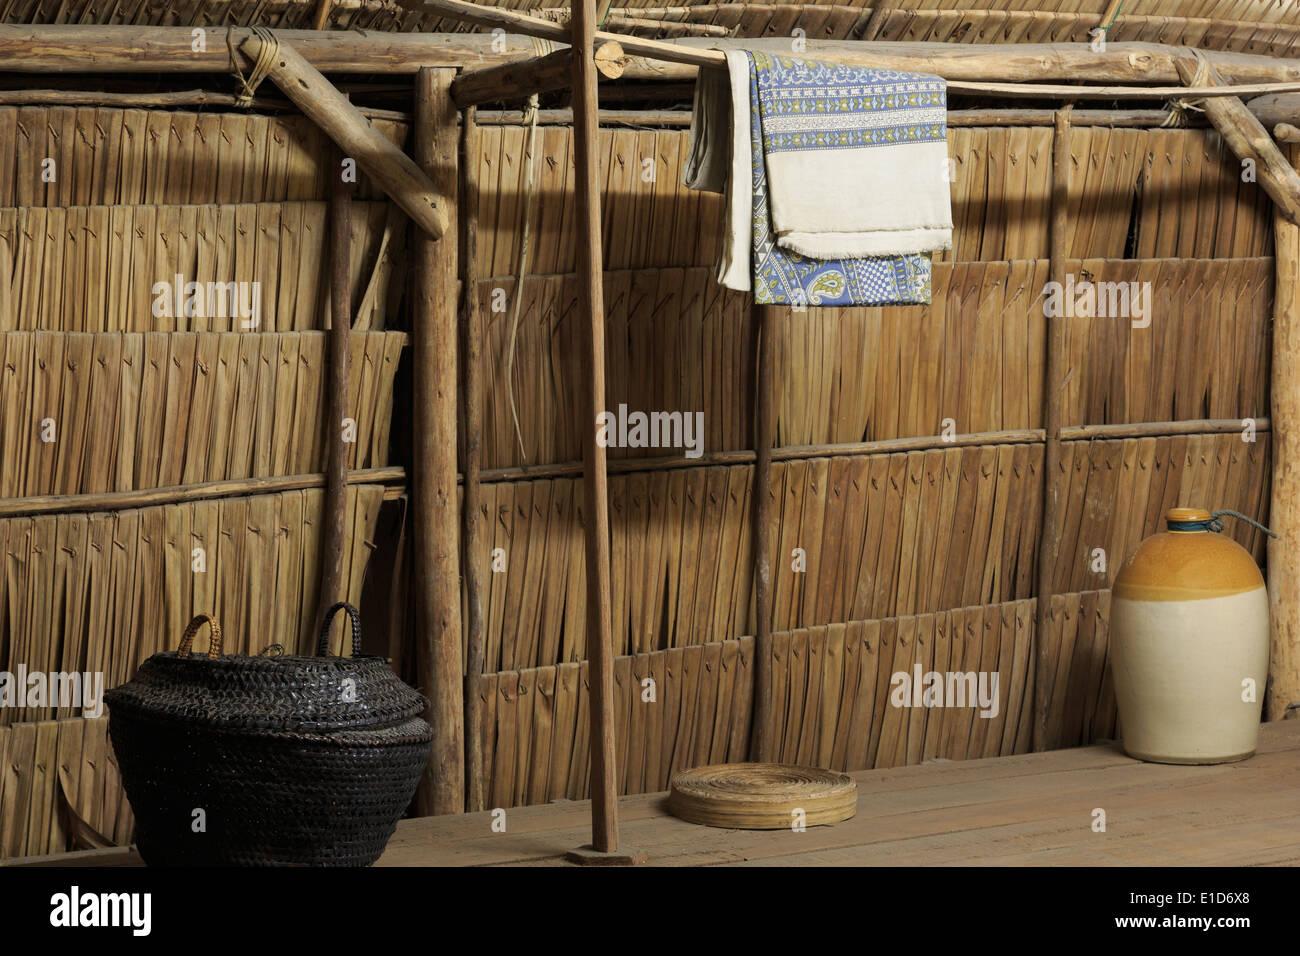 Anthropological Museum,Port Blair,Andaman Islands,India,Asia - Stock Image